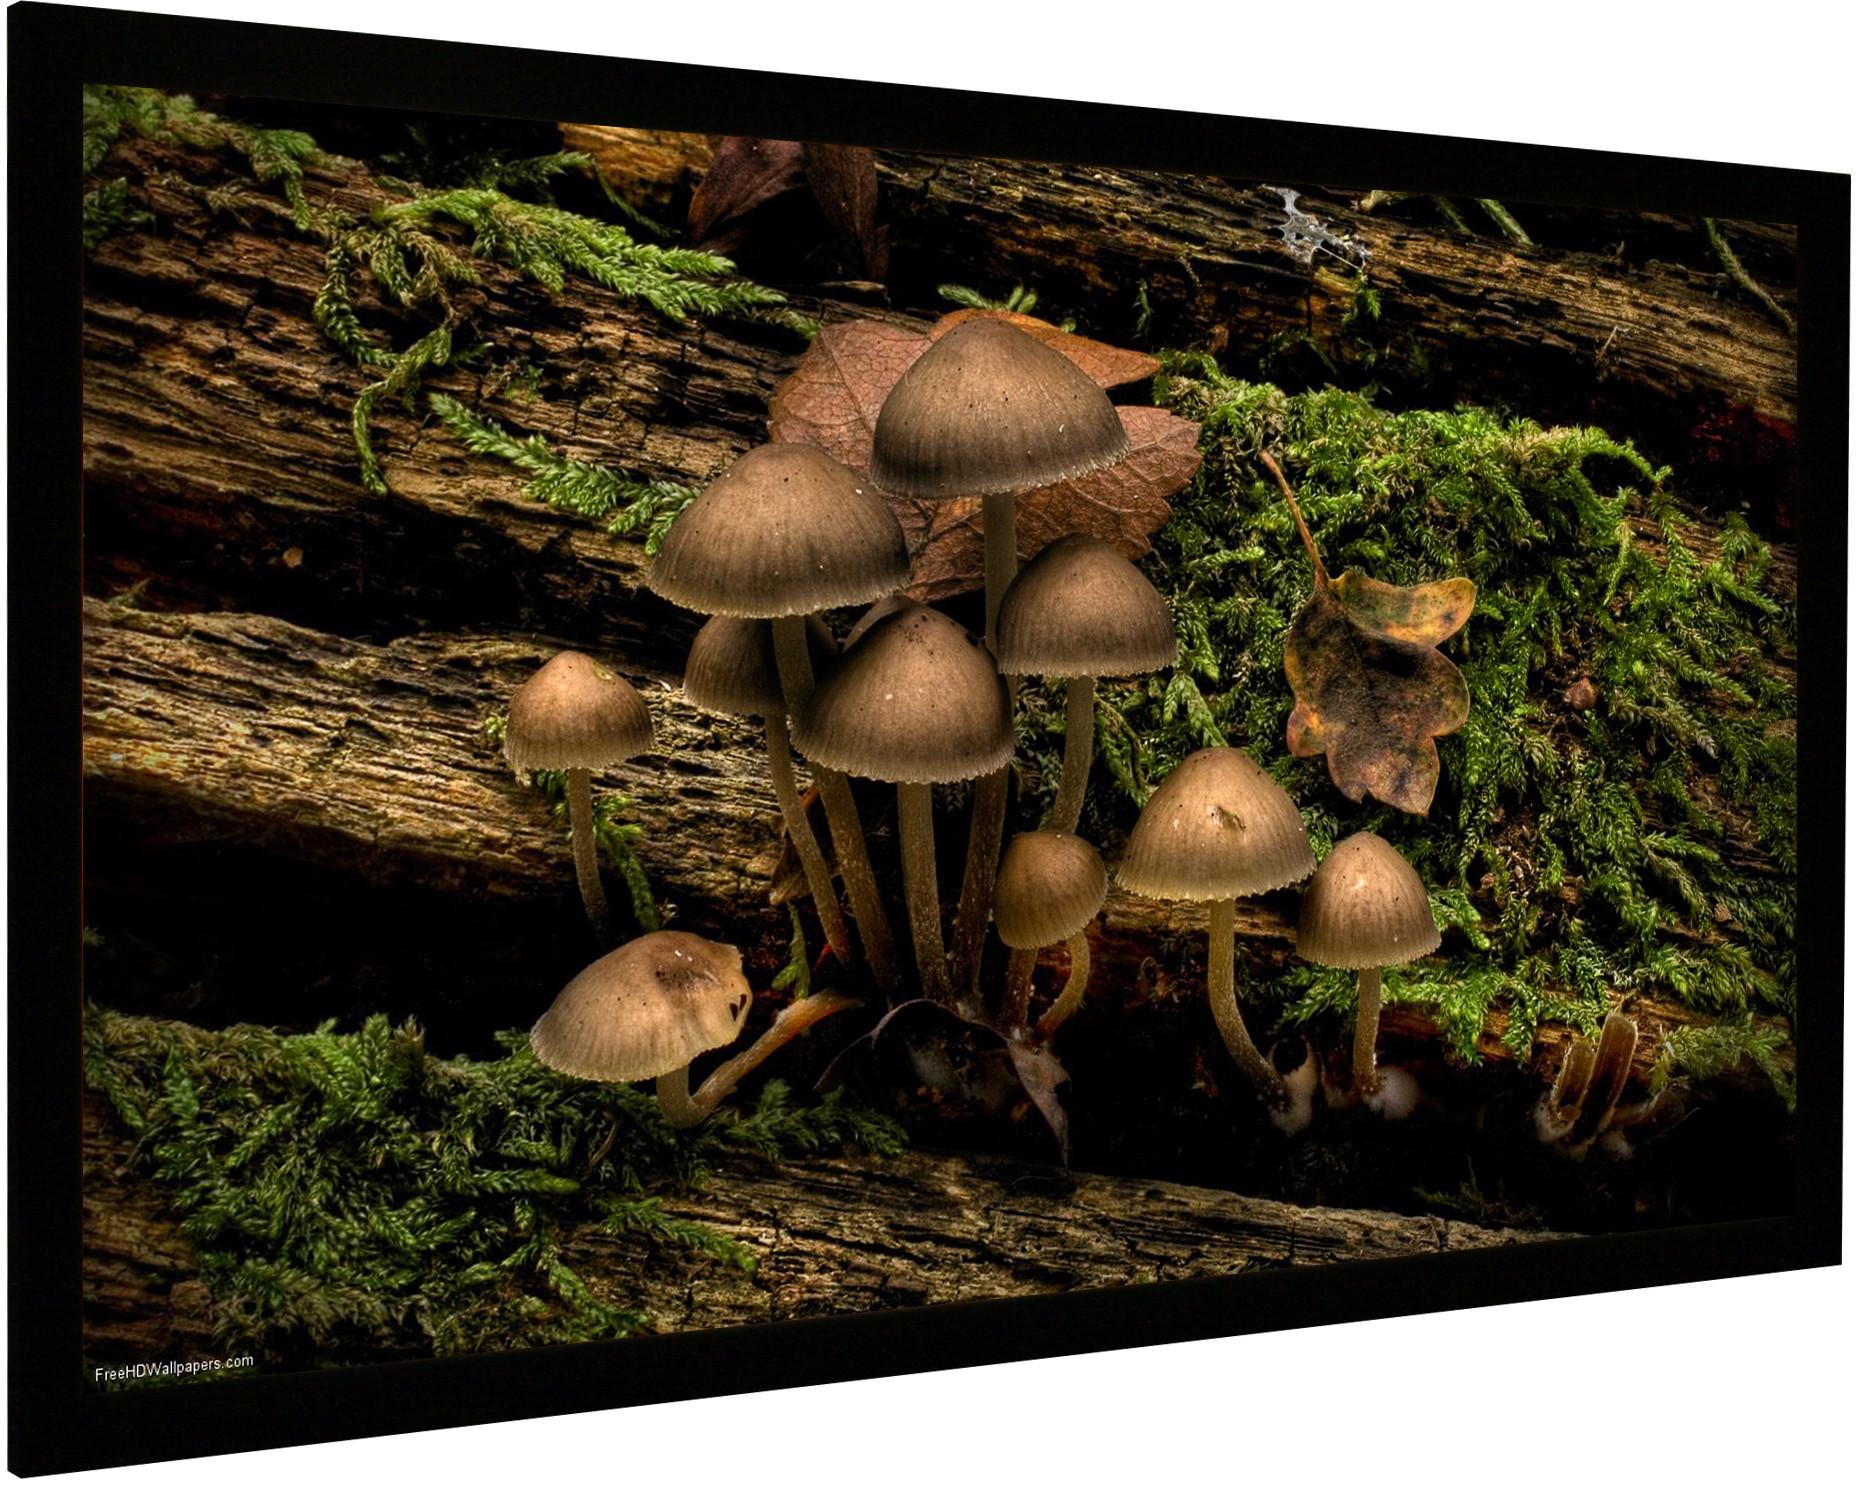 Vision Light 170 x 95,5 cm widescreen, Veltex og ReAct filmdug